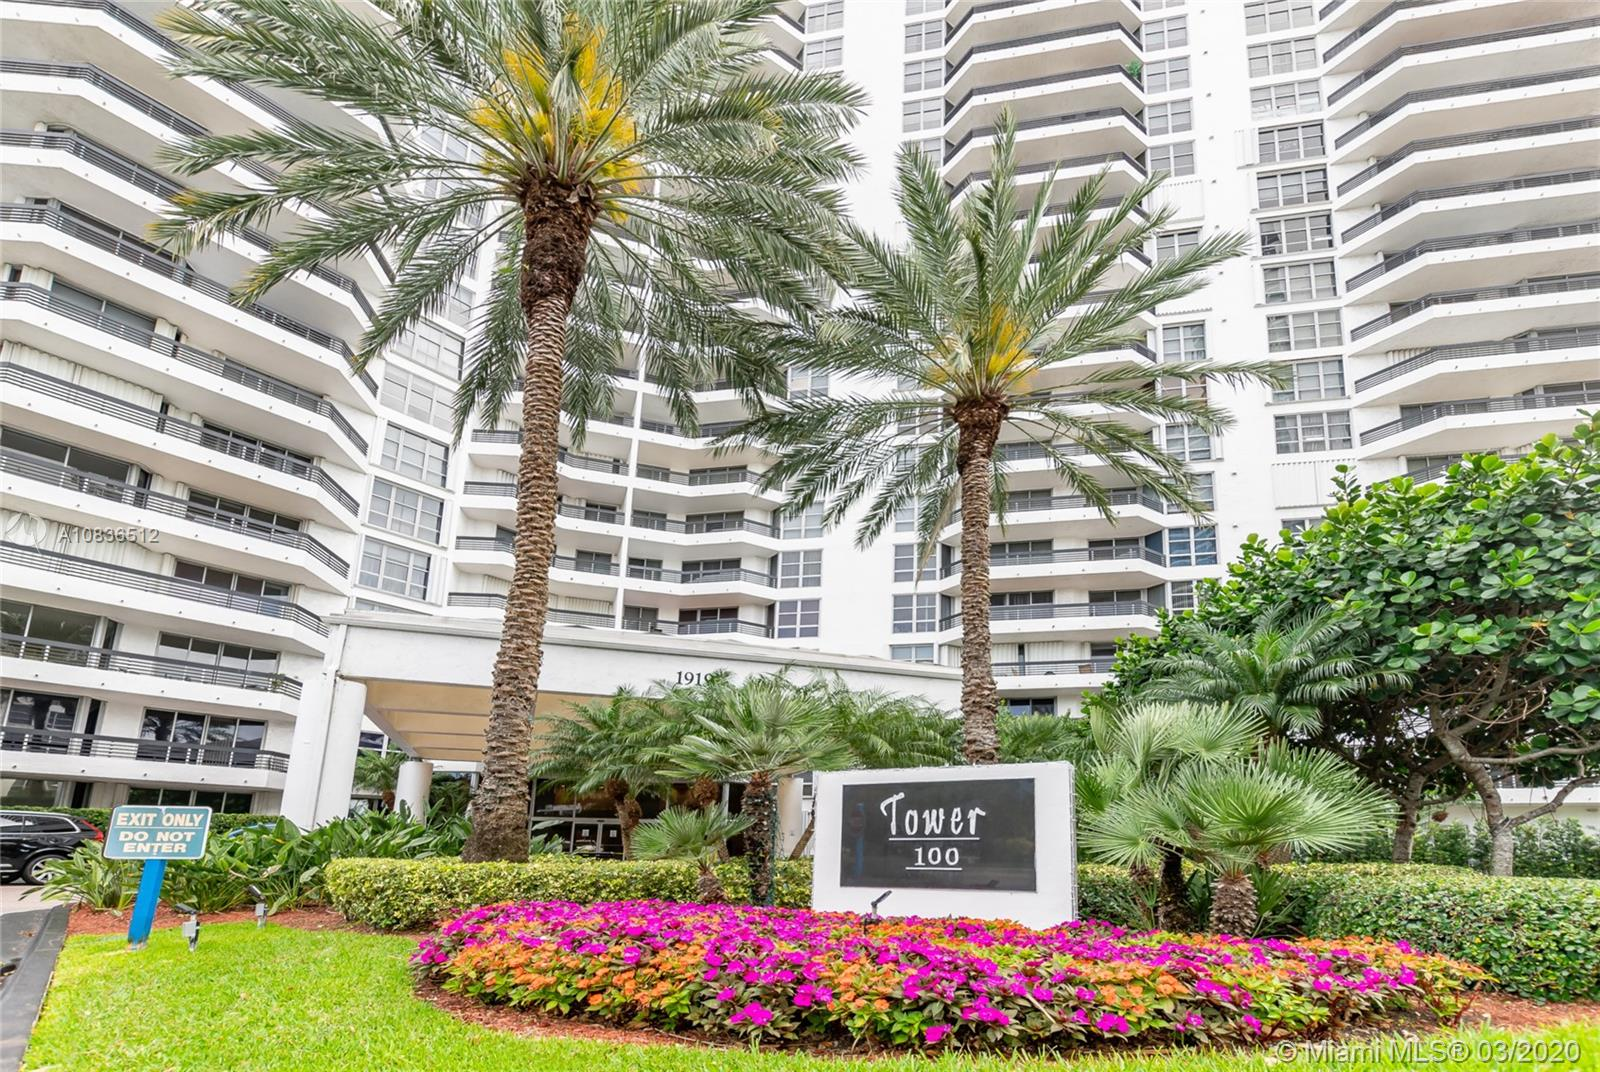 19195 Mystic Pointe Dr. #303, Aventura, FL 33180 - Aventura, FL real estate listing